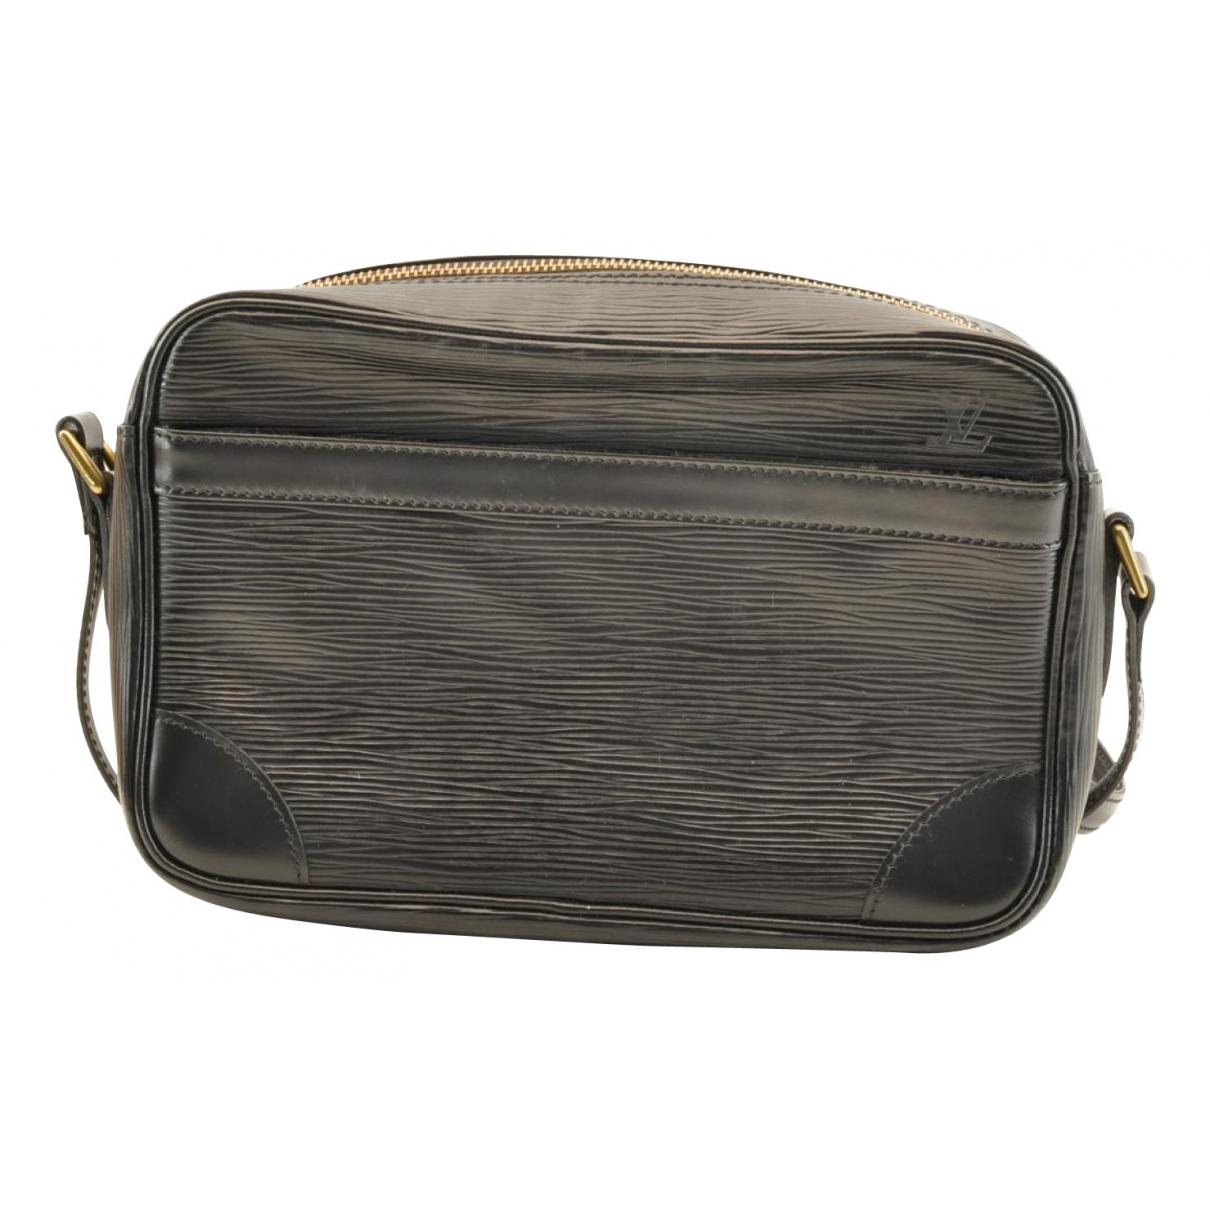 Louis Vuitton Trocadéro Black Leather handbag for Women N